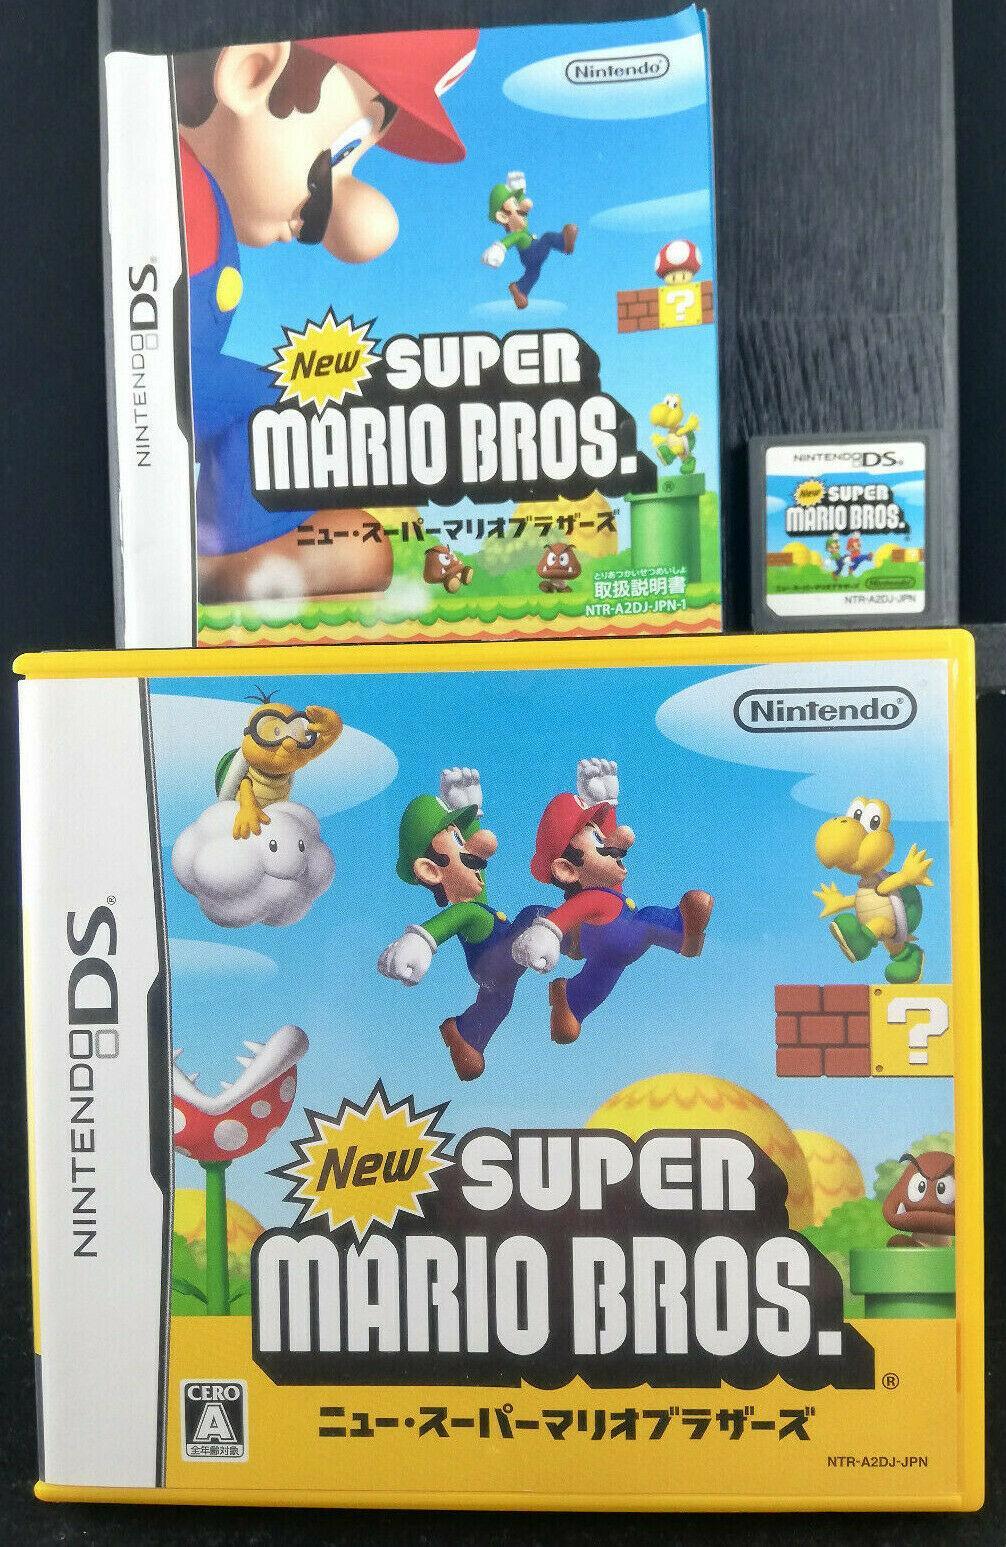 New Super Mario Bros  - Nintendo DS - 2006 - NTR-A2DJ-JPN - Japan Import